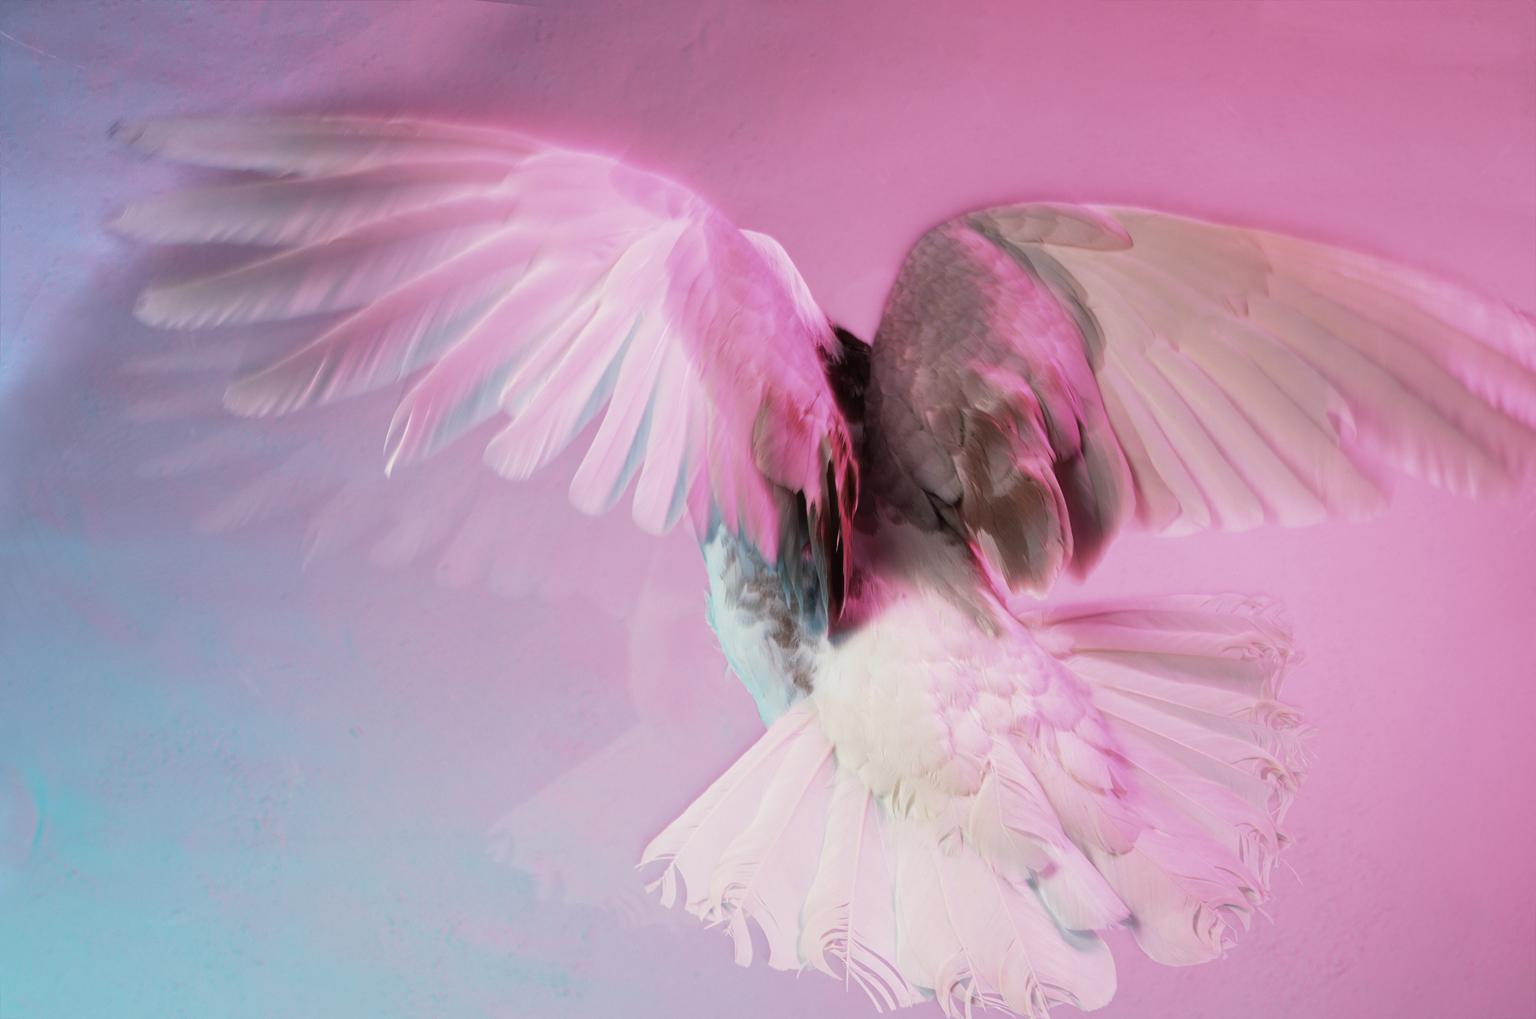 Scan_013 Bird_1H_crop.png